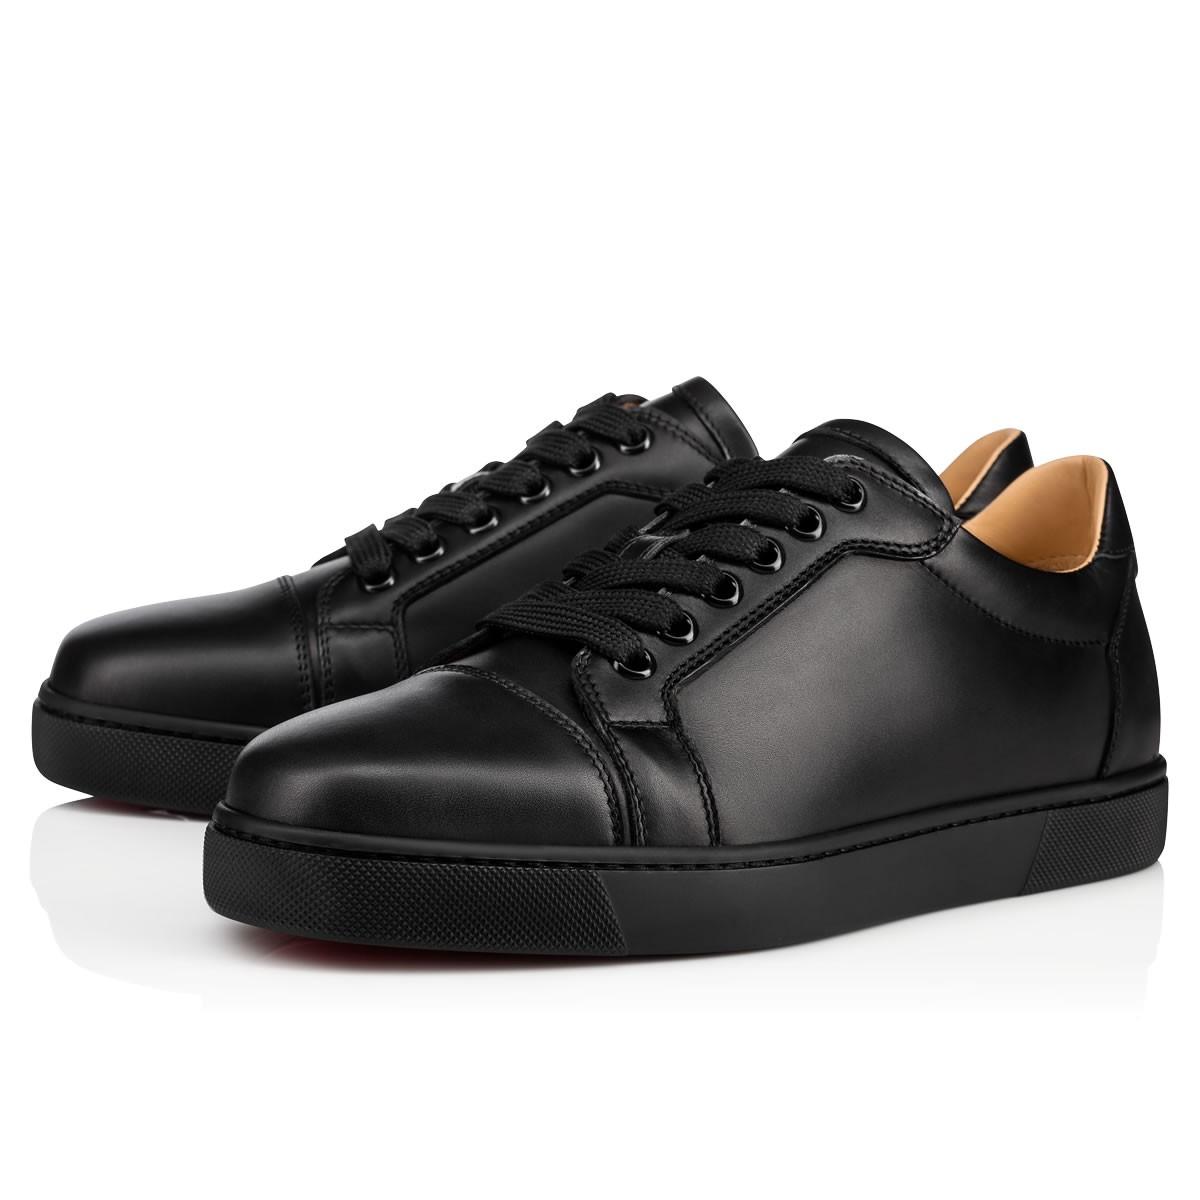 VIEIRA FLAT Black Leather - Women Shoes